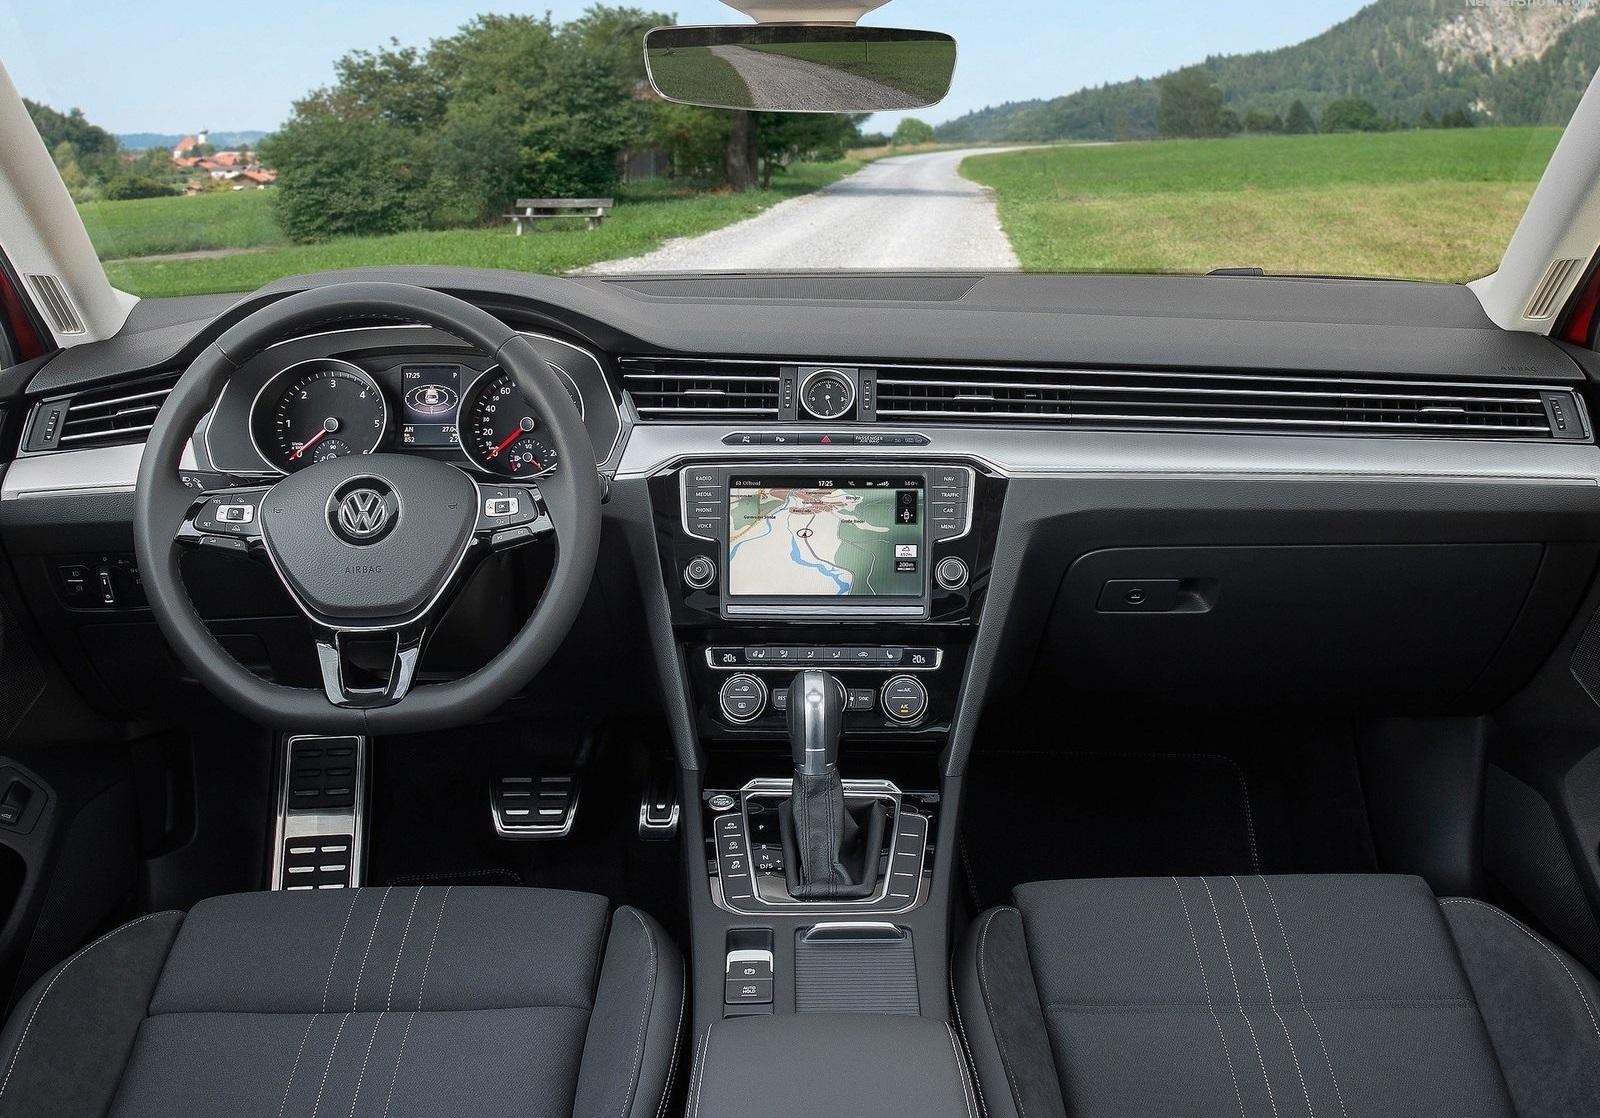 2016 Volkswagen Passat Alltrack Dashboard Interior (Photo 4 of 18)